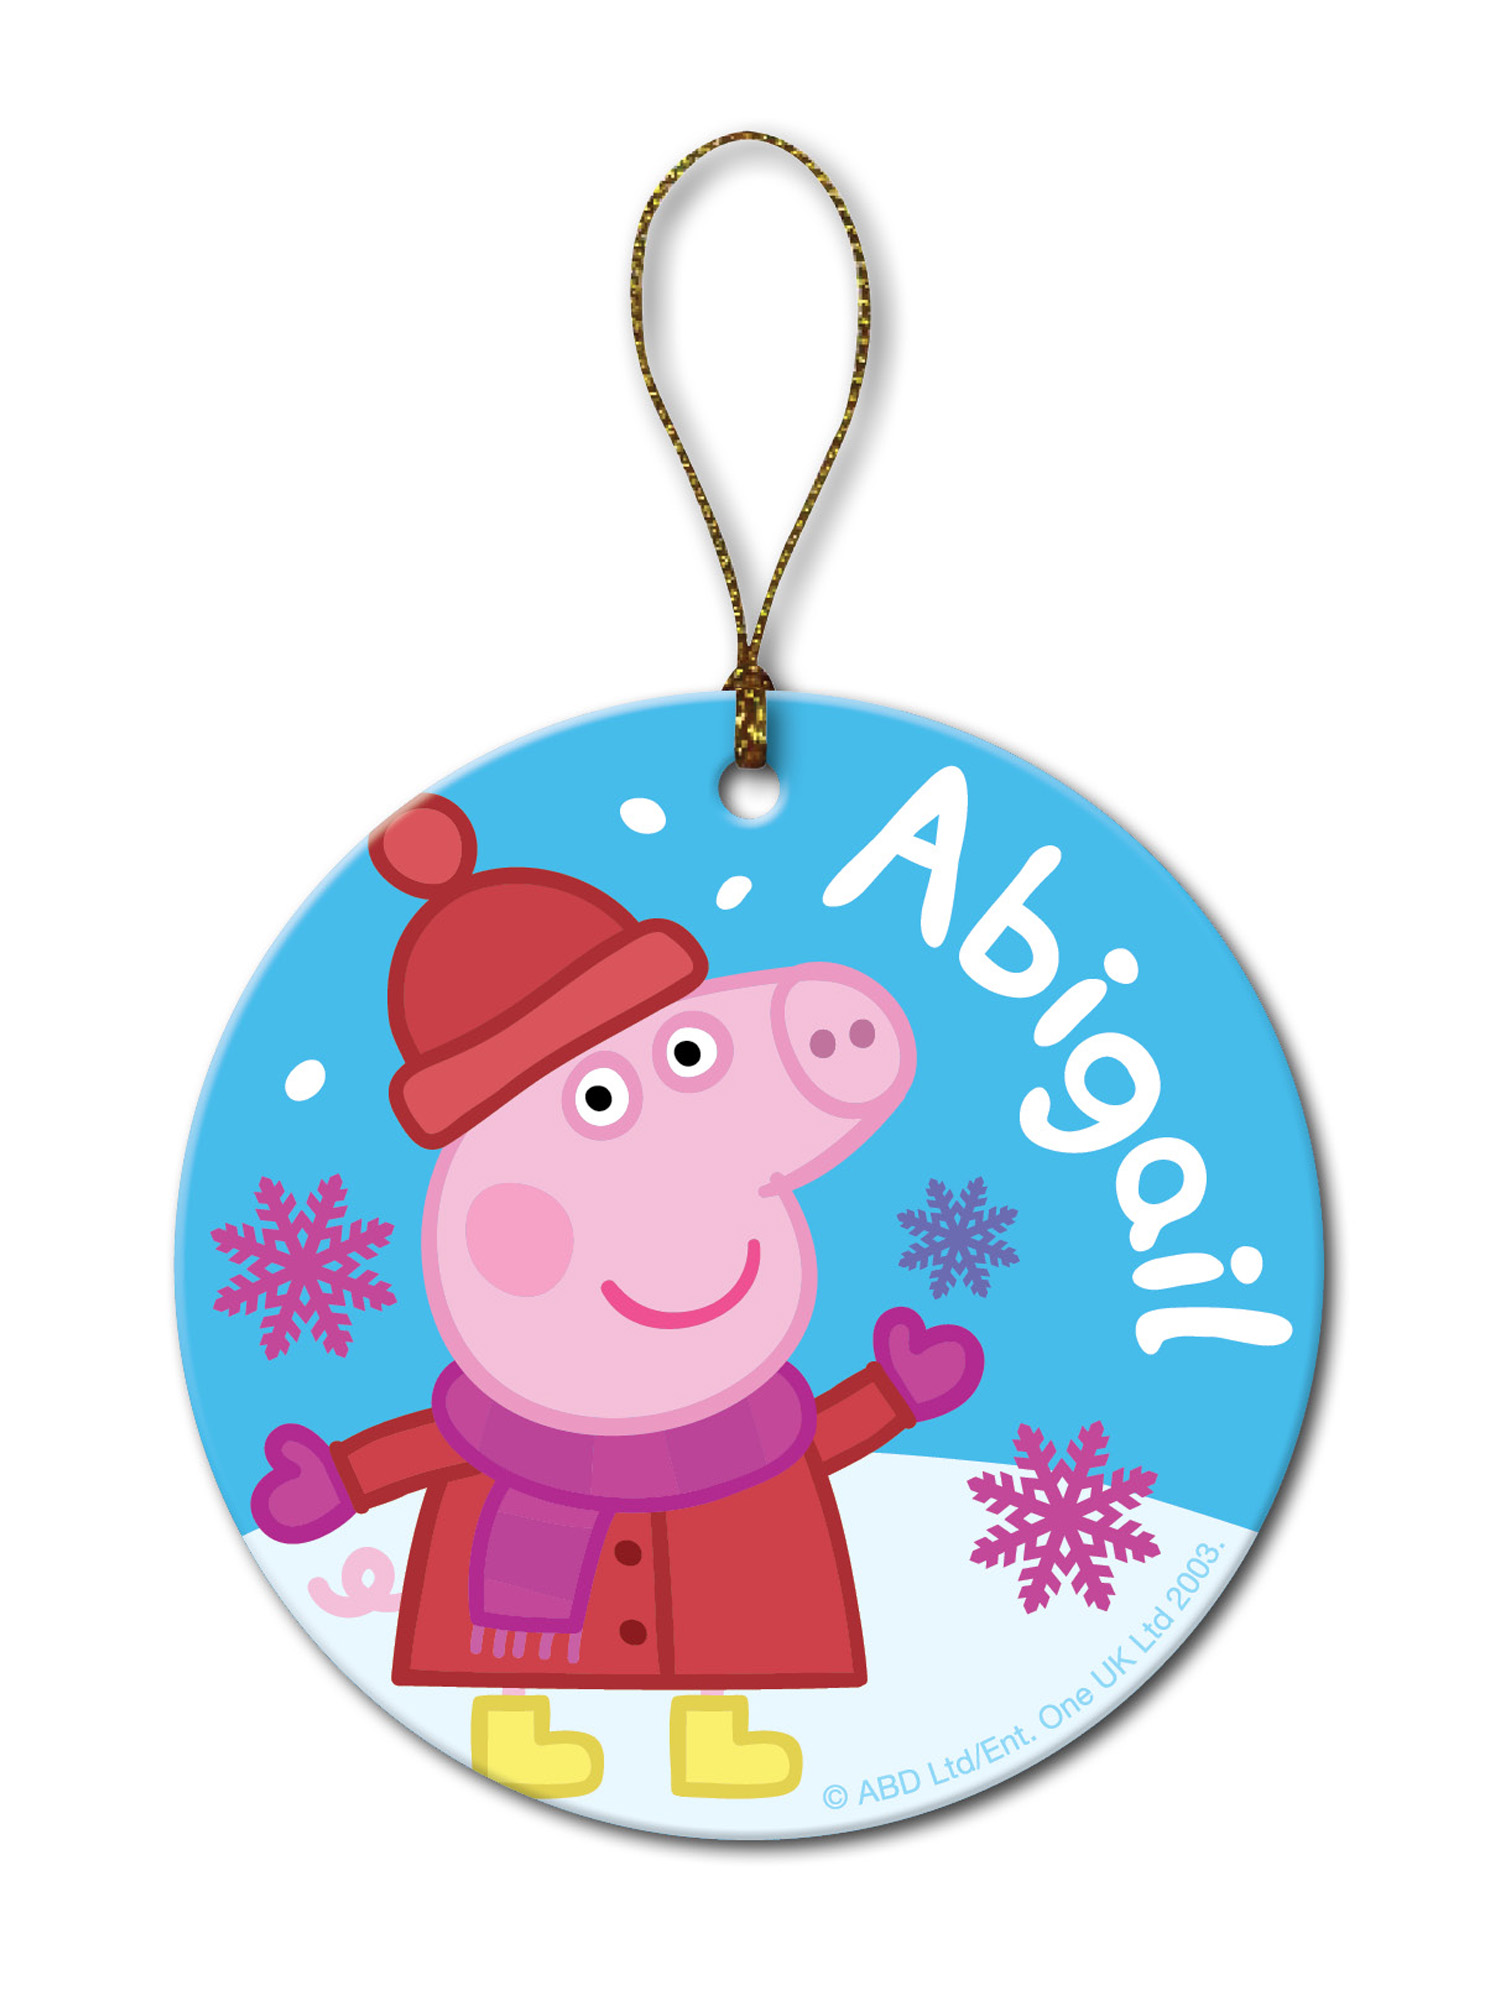 PRINCESS PEPPA PIG PERSONALIZED NAME 2020 METAL CHRISTMAS ORNAMENT GIFT TAG